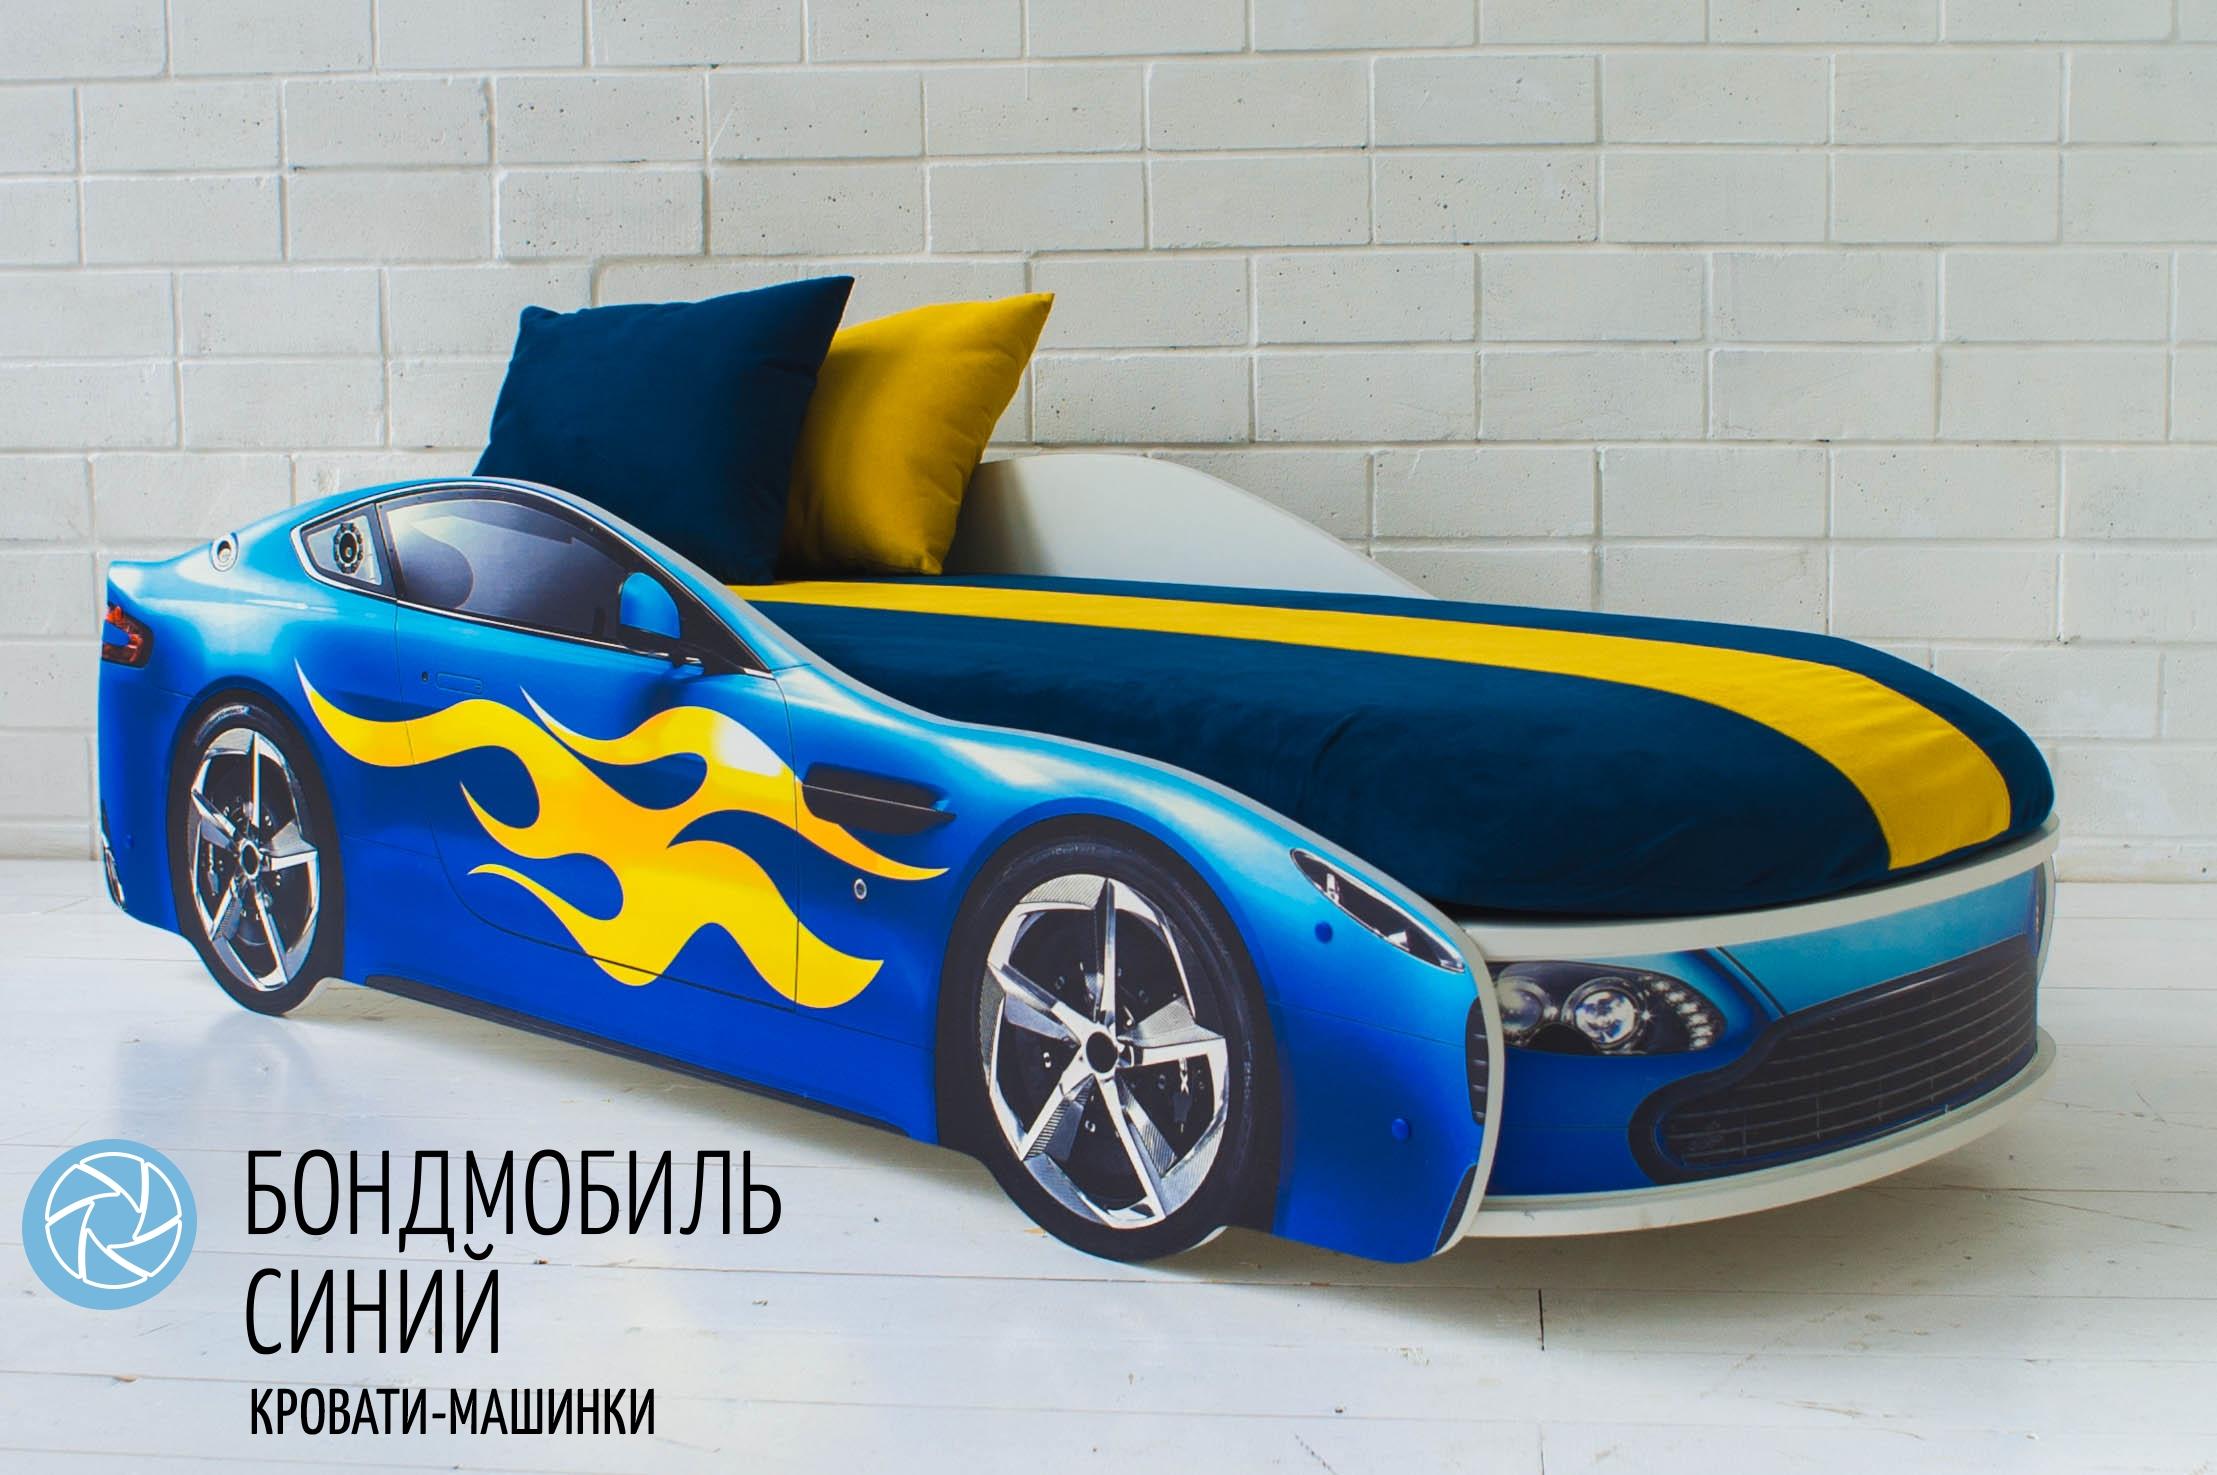 bed-bondmobil-sinyi_1